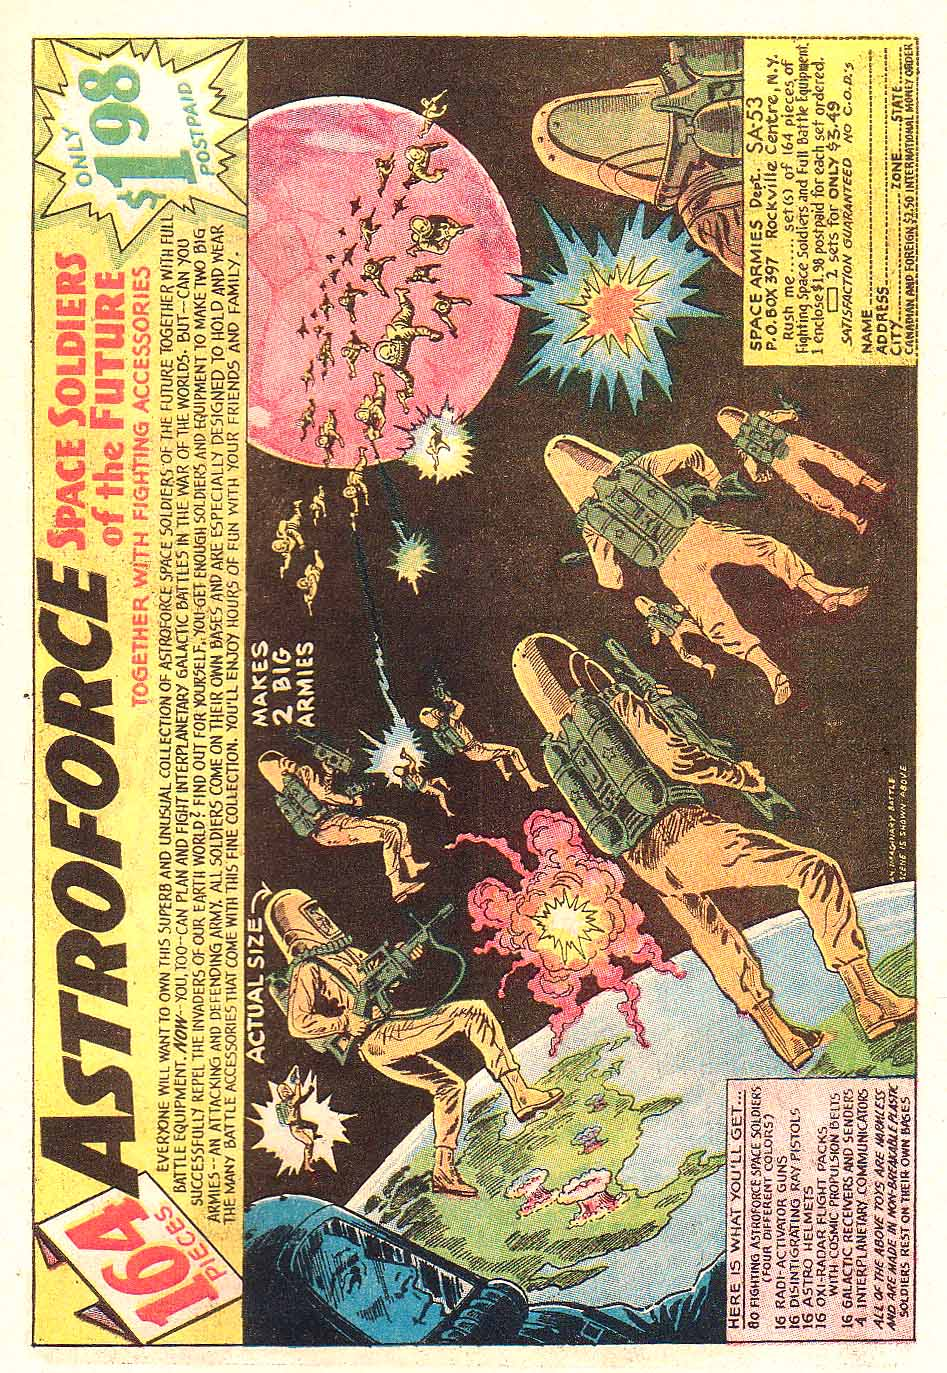 Read online Aquaman (1962) comic -  Issue #20 - 23